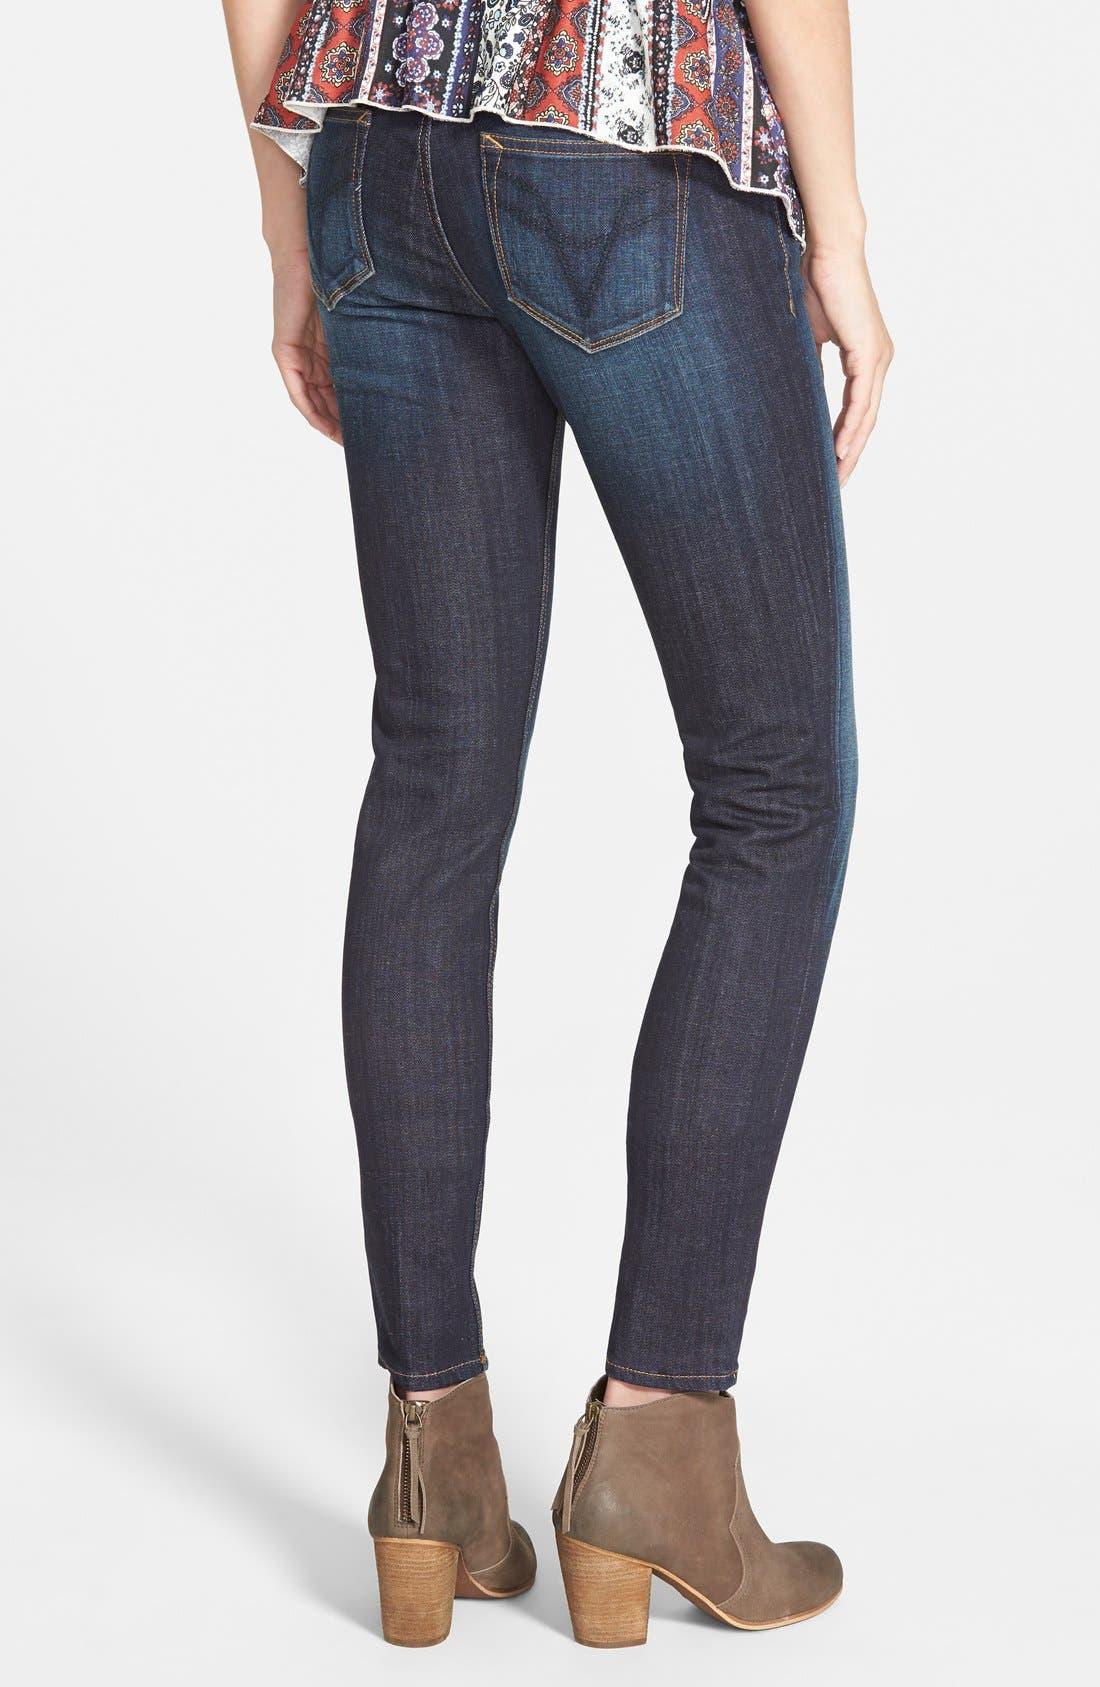 Alternate Image 2  - Vigoss 'Chelsea' Skinny Jeans (Dark Wash)